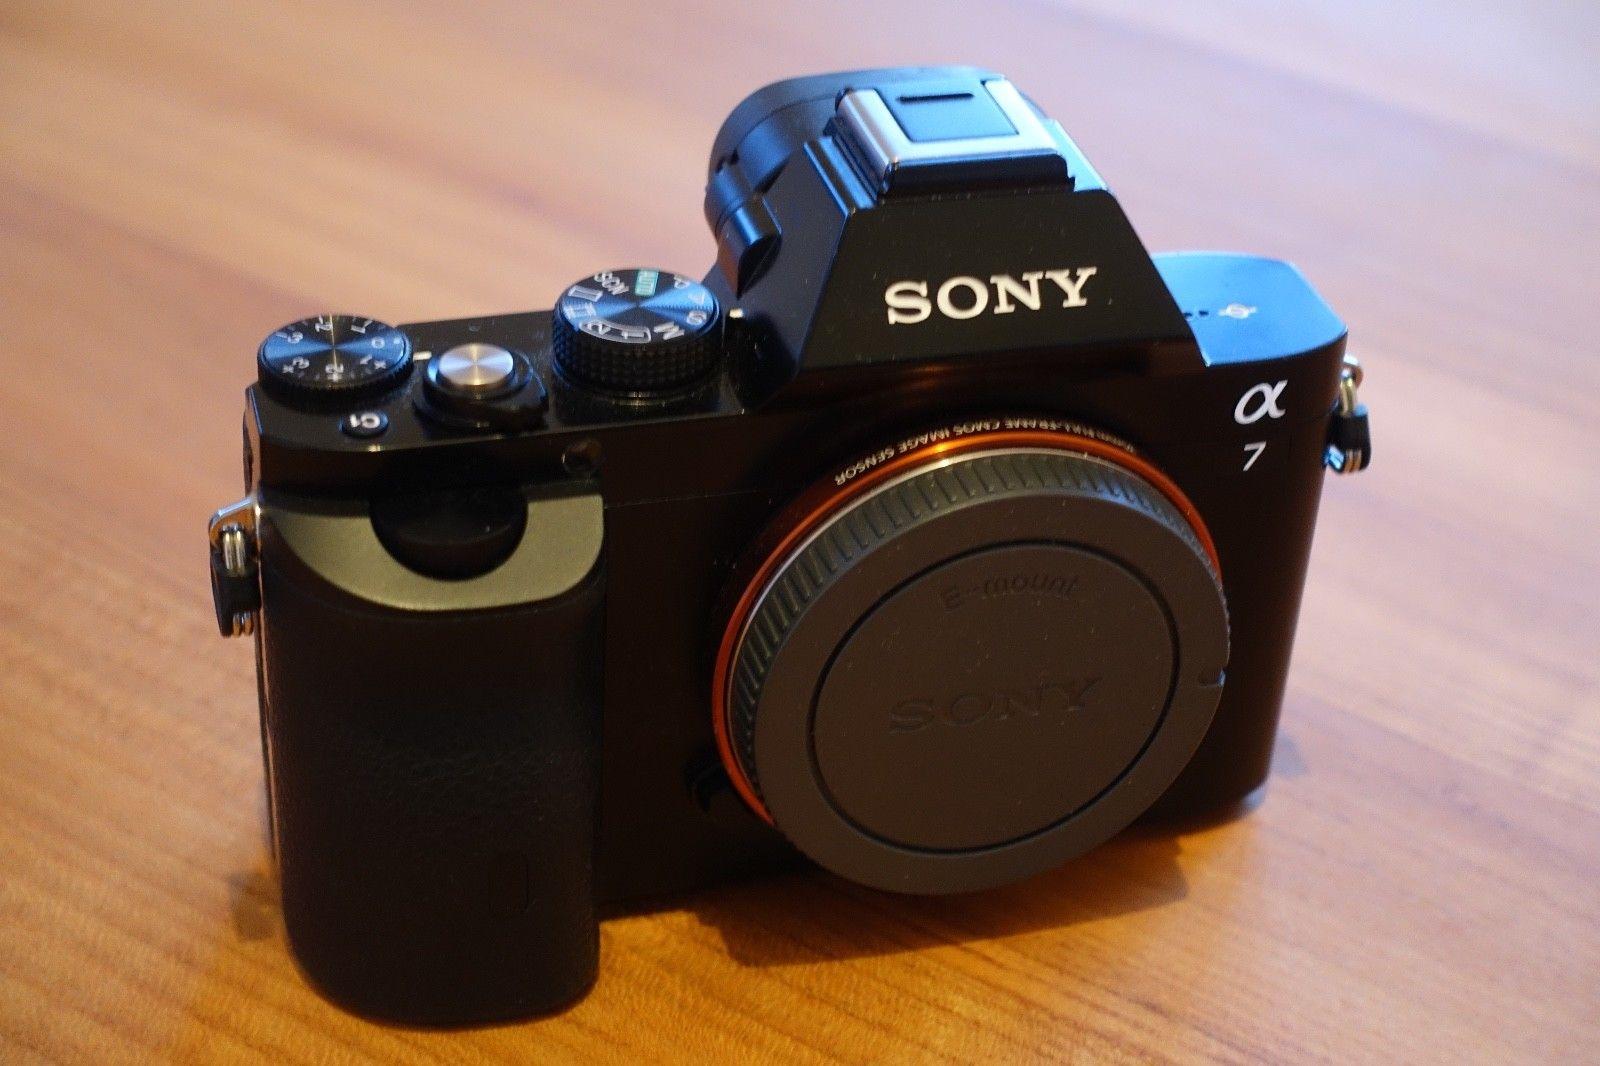 Sony Alpha ILCE-7 24.3 MP - Body only - Gehäuse, Sony A7 mit extras 1.448 Bilder